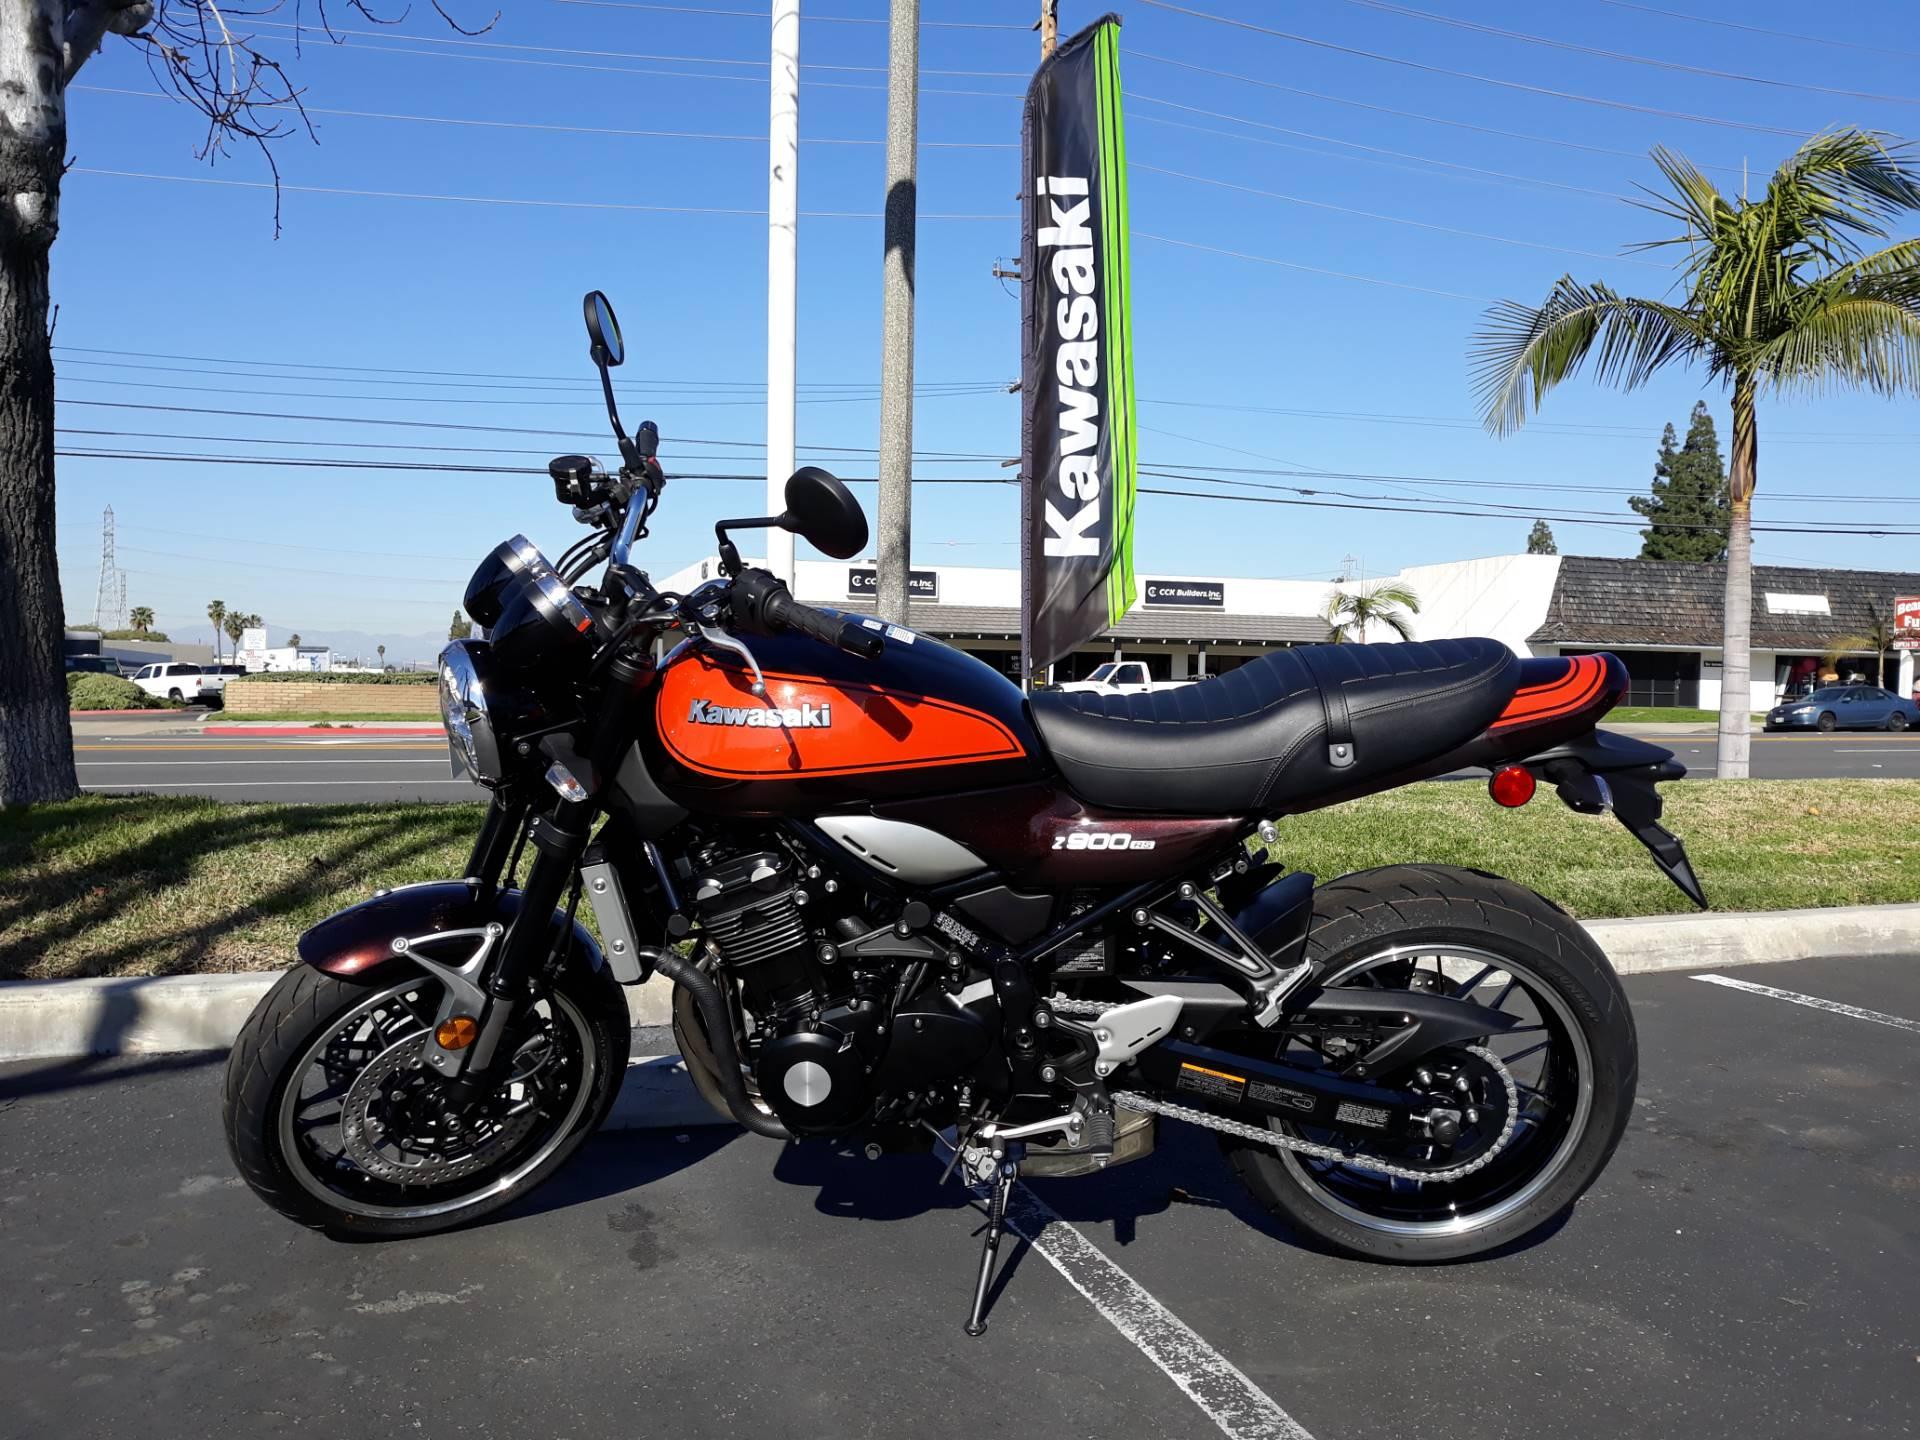 2018 Kawasaki Z900RS for sale 45221